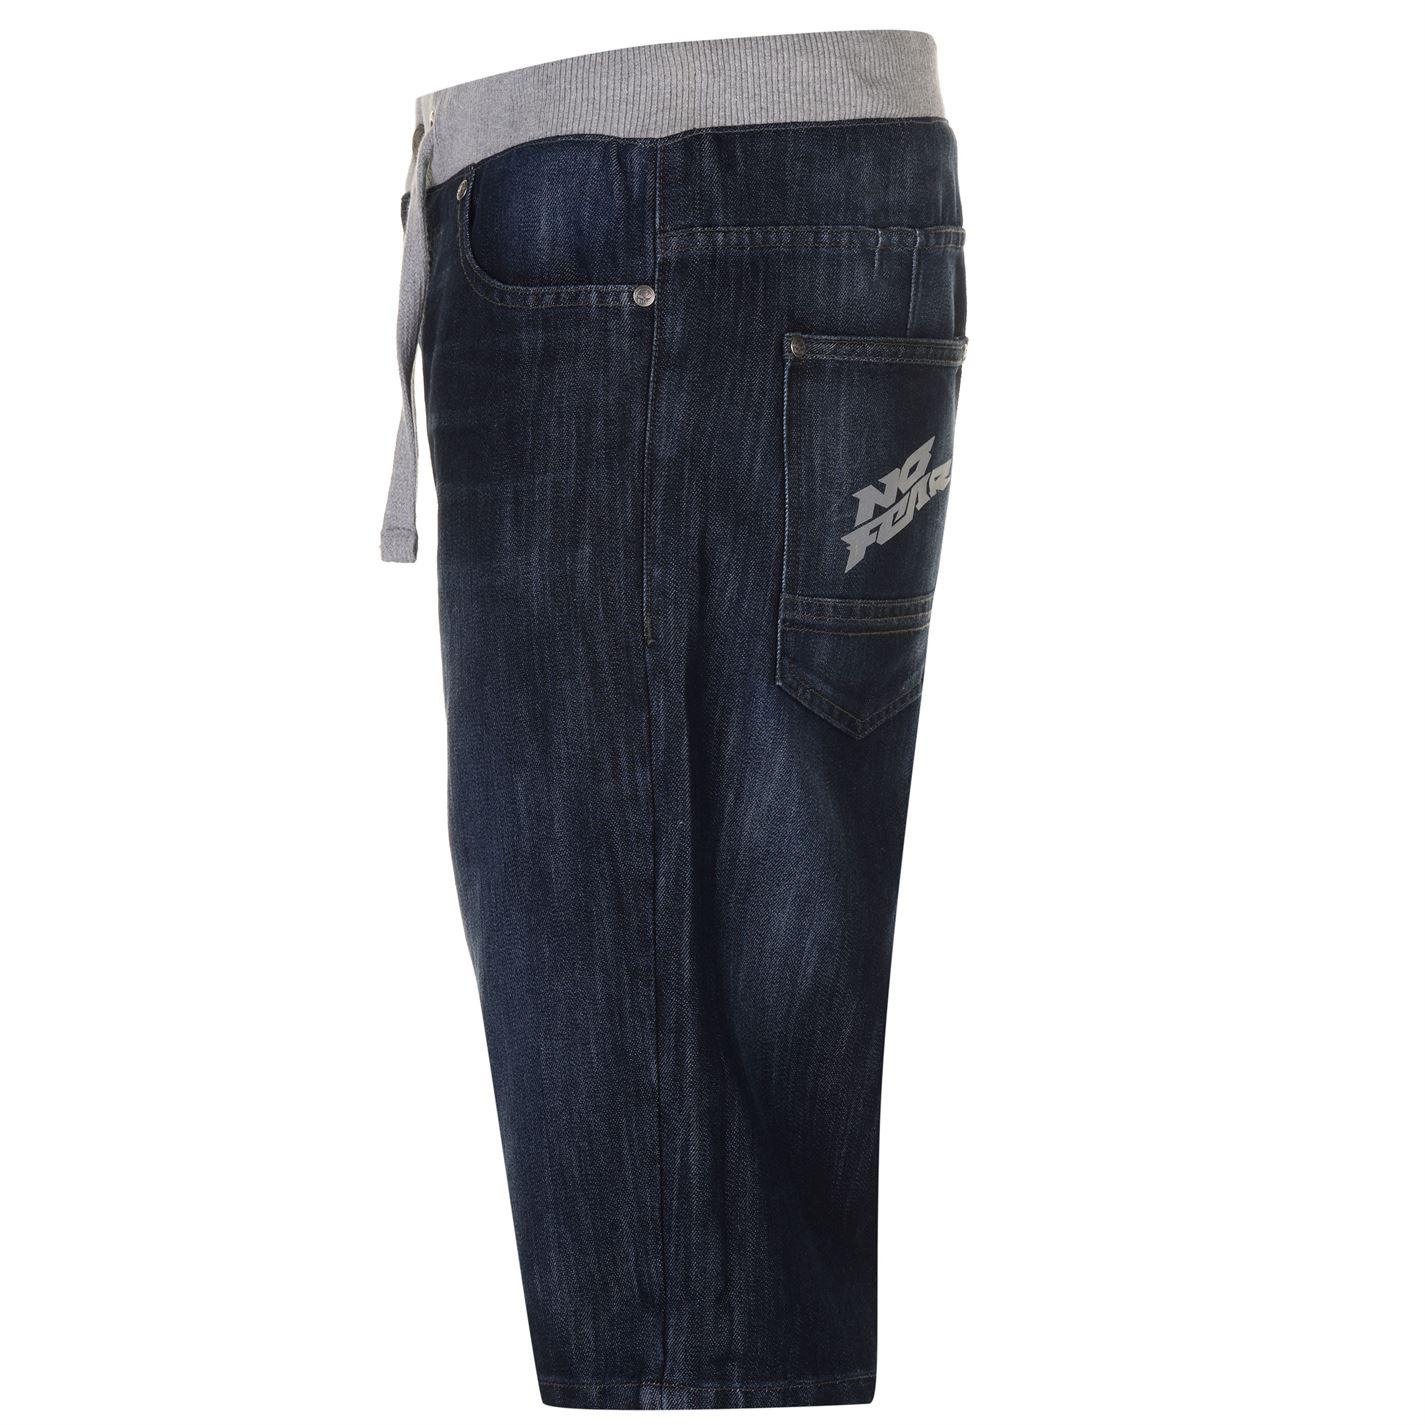 No-Fear-Mens-Denim-Shorts-Pants-Trousers-Bottoms-Zip-Warm-Drawstring-Elasticated thumbnail 5